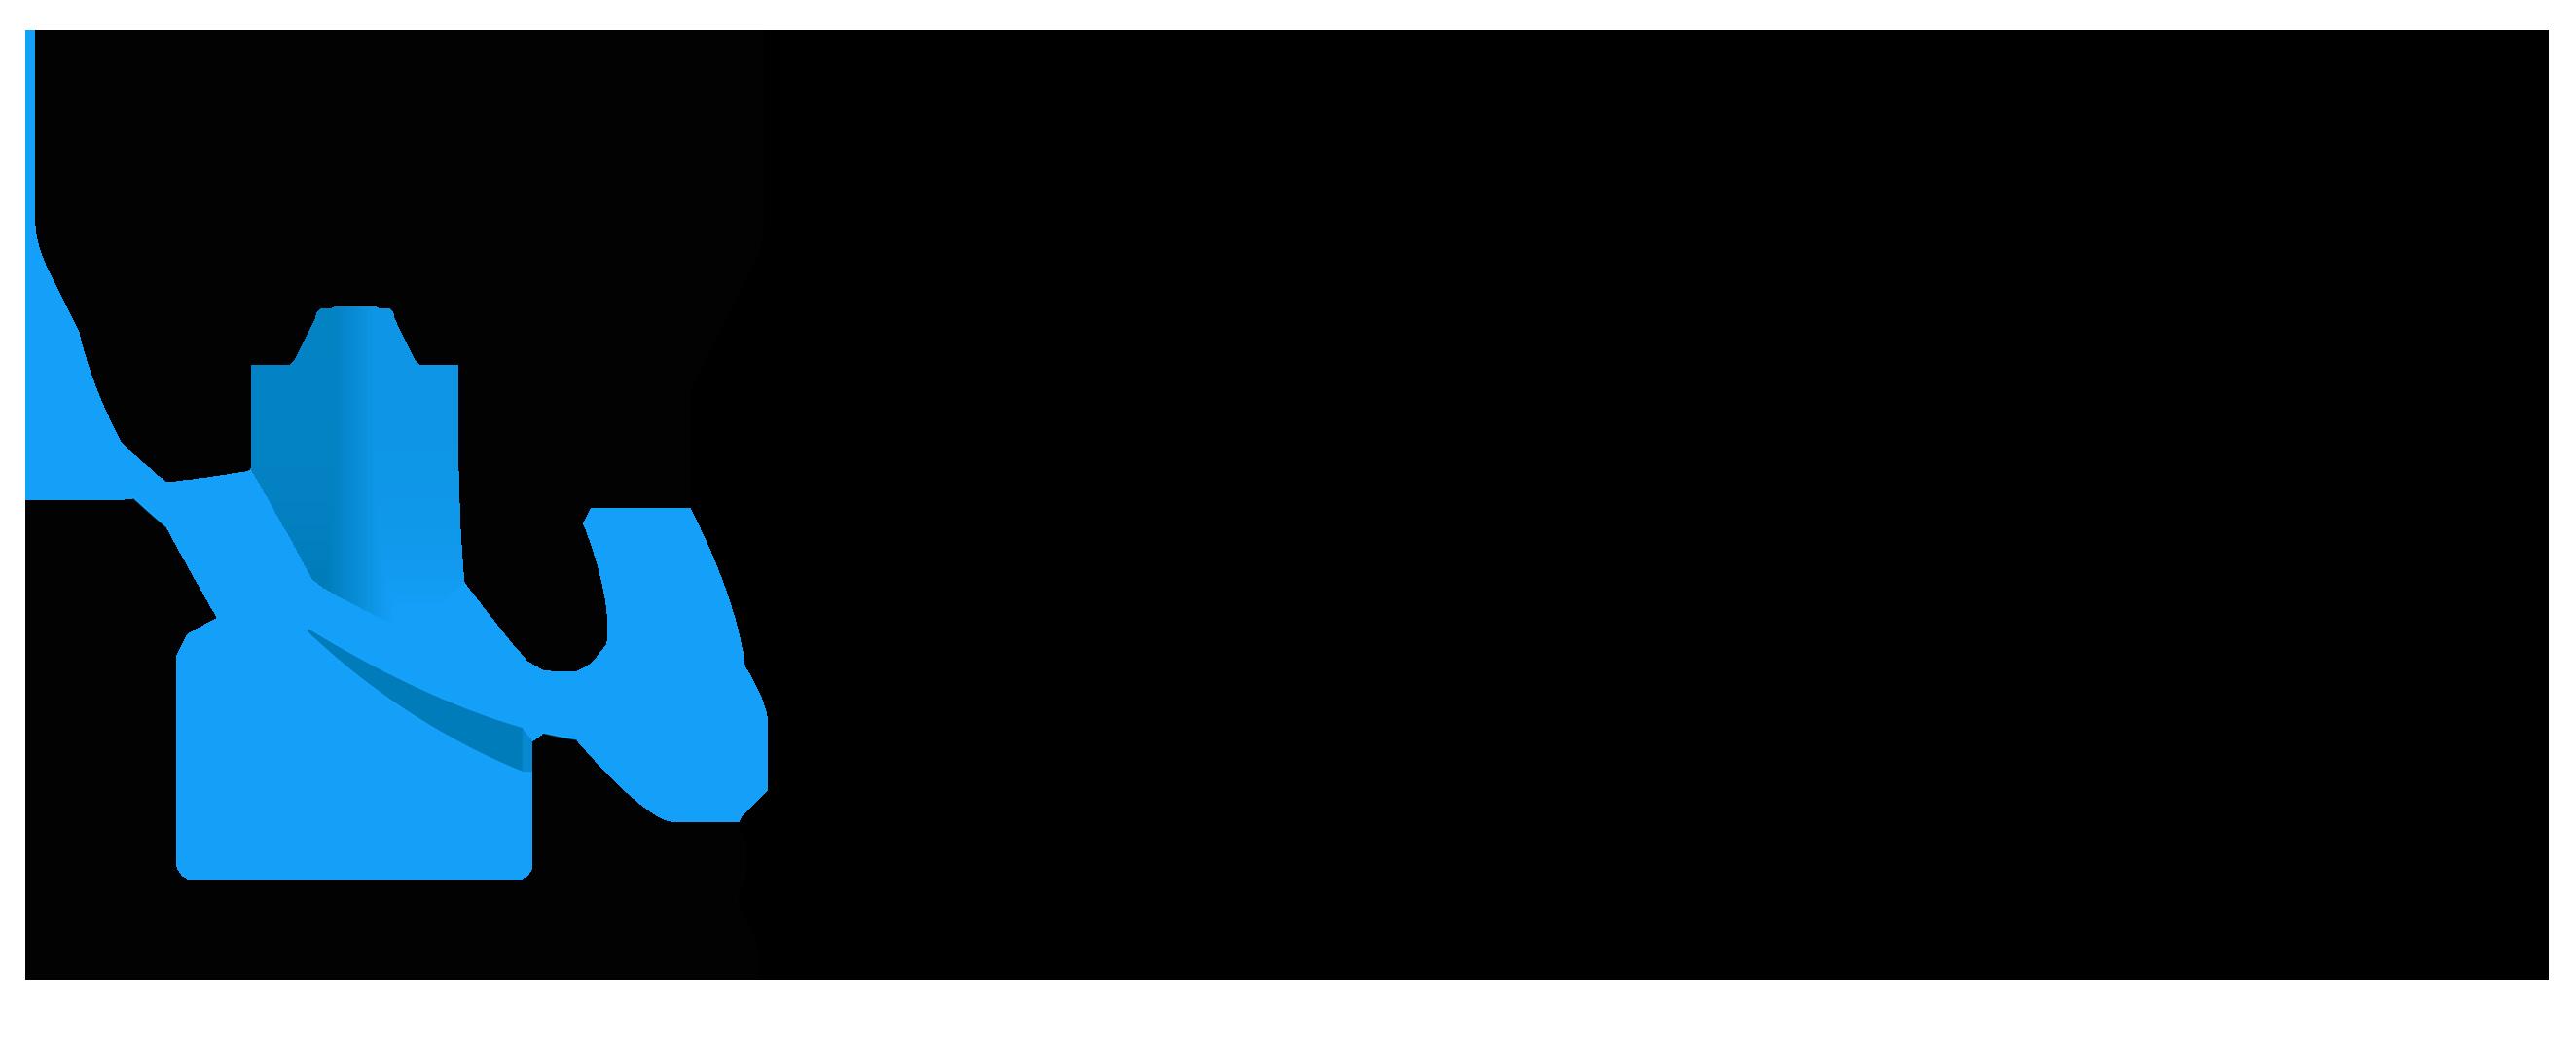 DIGITCARD